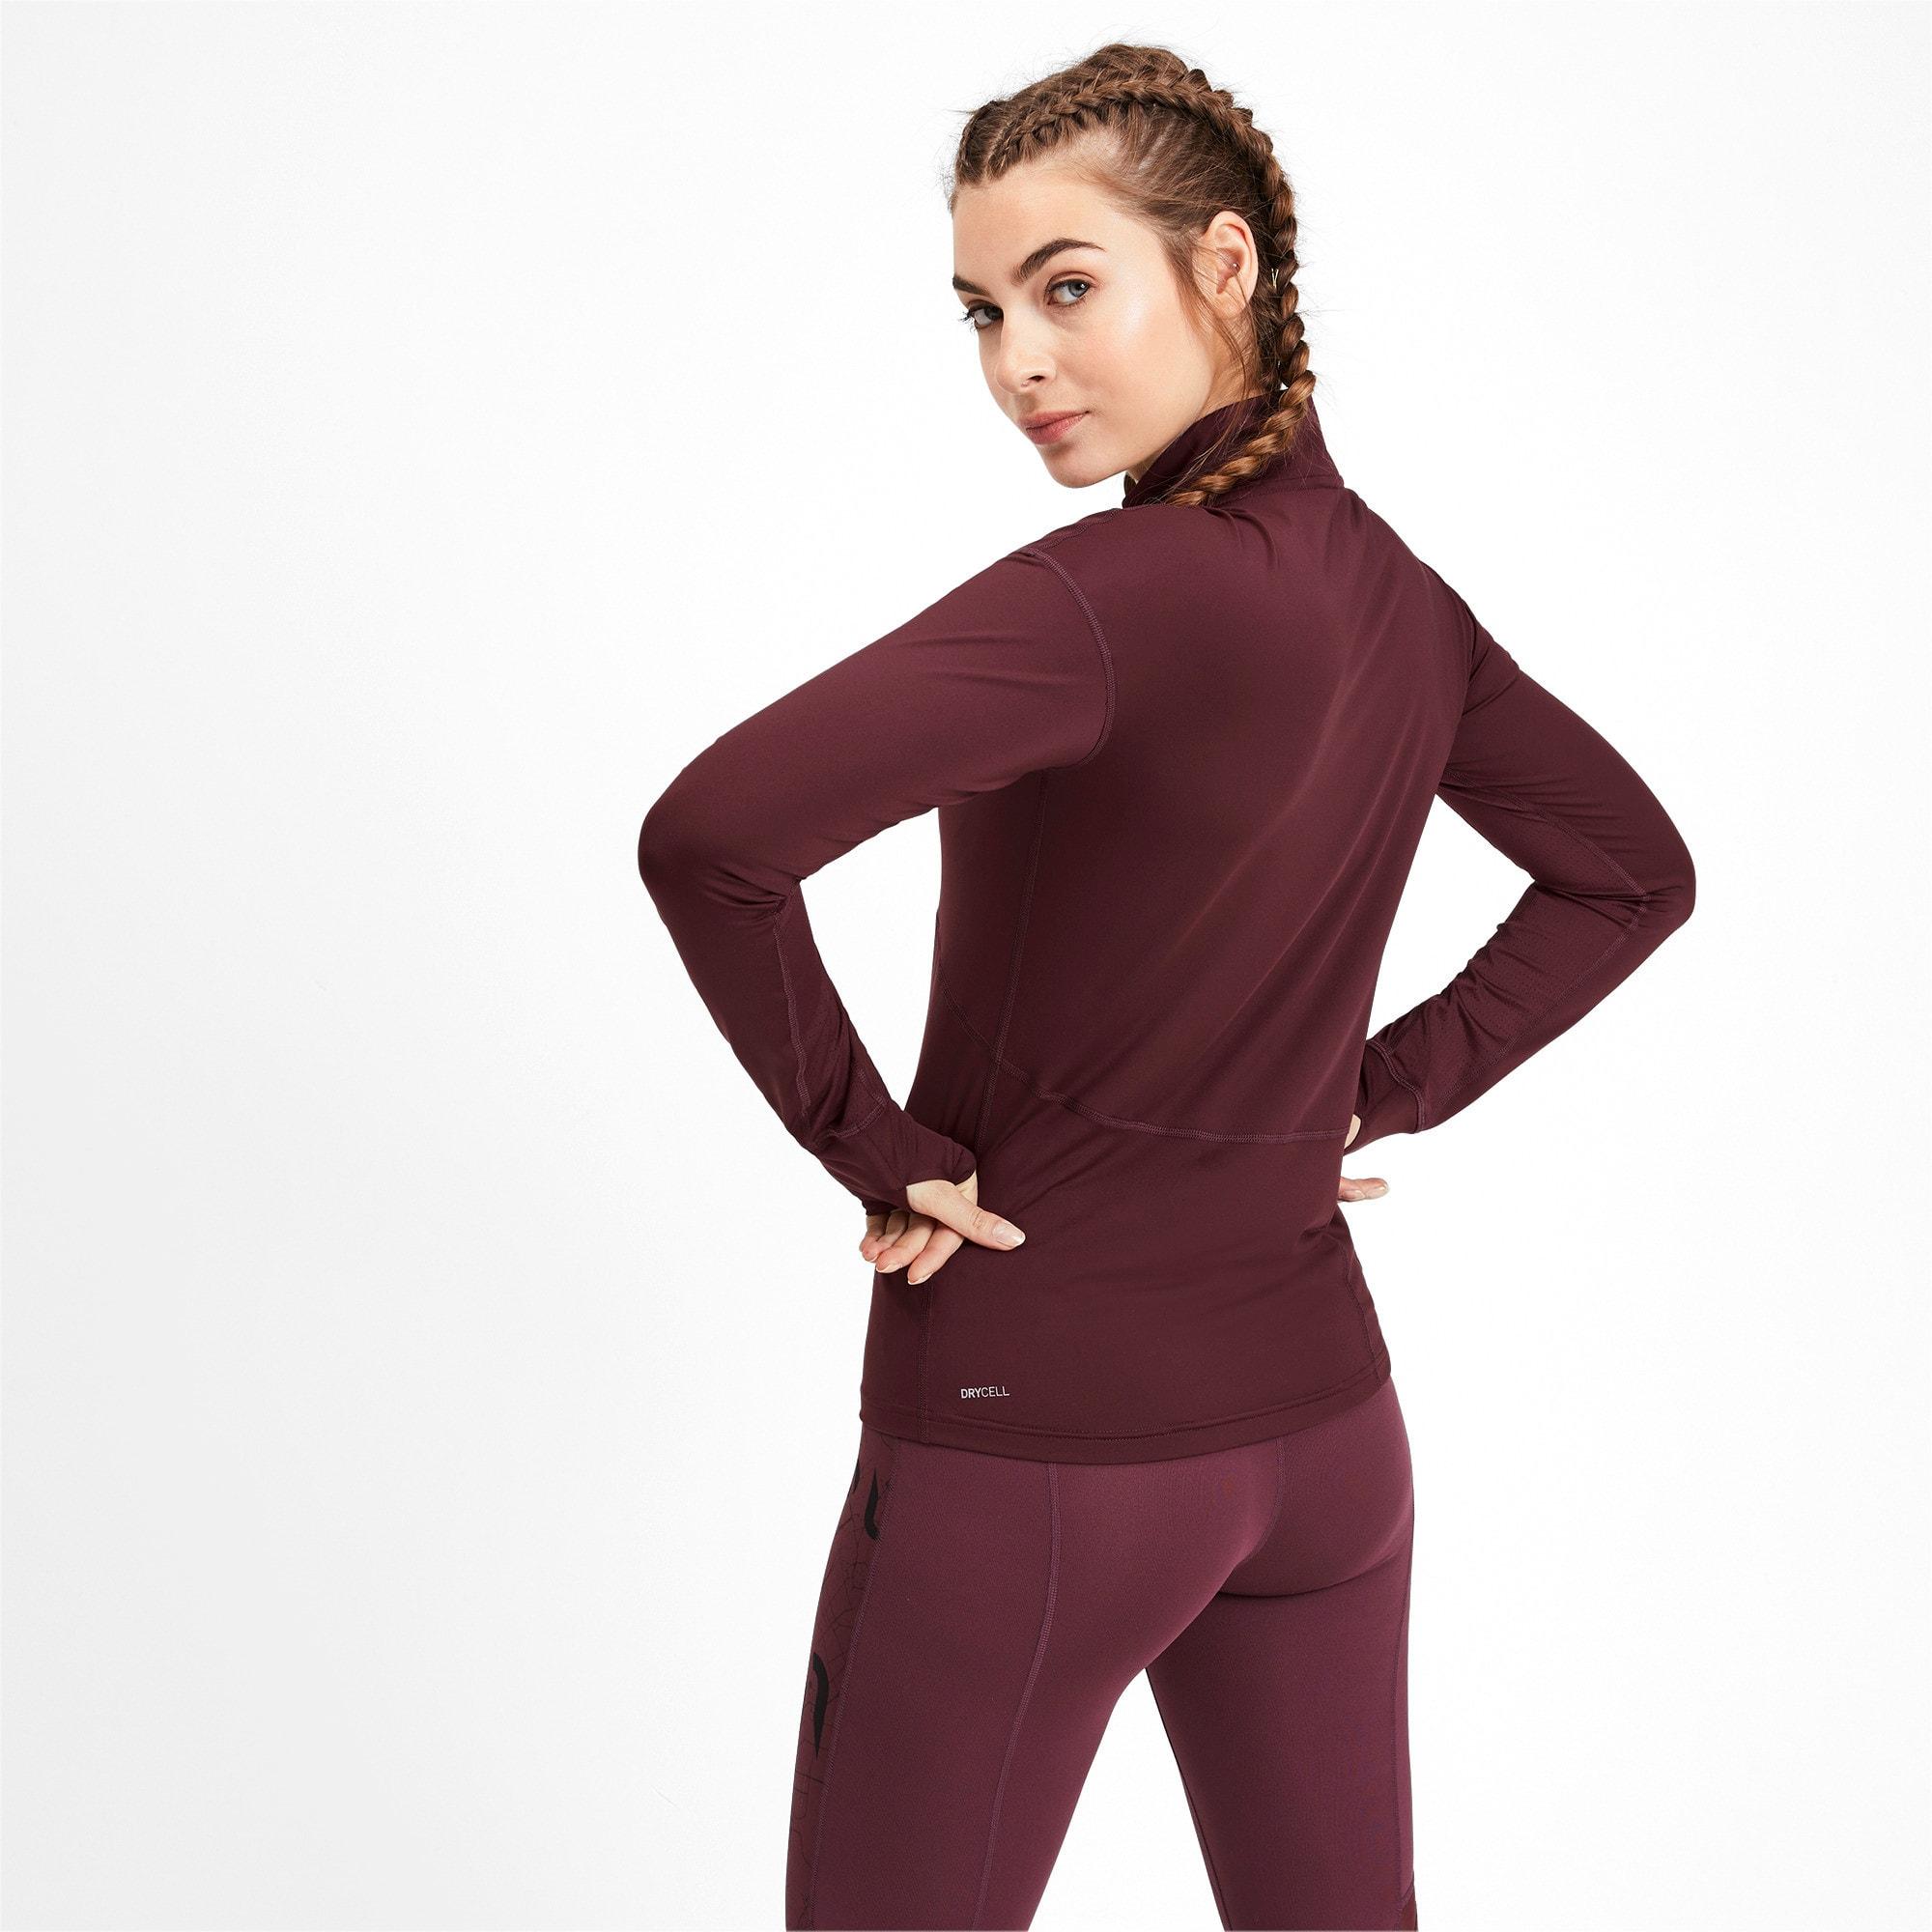 Thumbnail 2 of ADHM 2019 IGNITE Long Sleeve Women's Running Pullover, Vineyard Wine, medium-IND